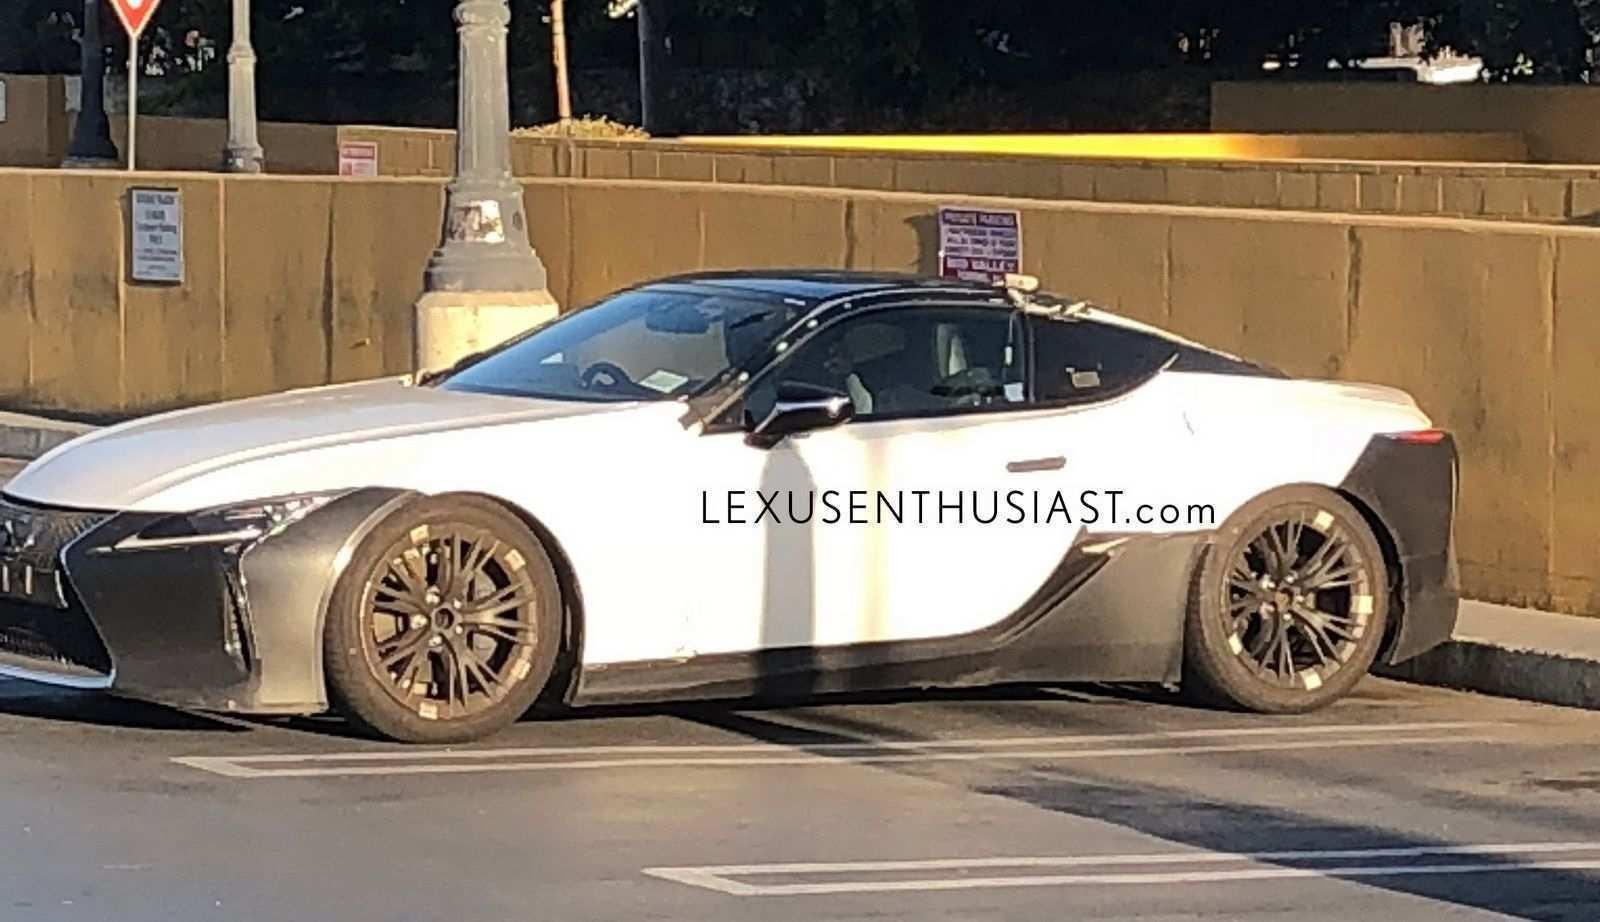 17 Gallery of Lexus 2020 Exterior Date Specs for Lexus 2020 Exterior Date